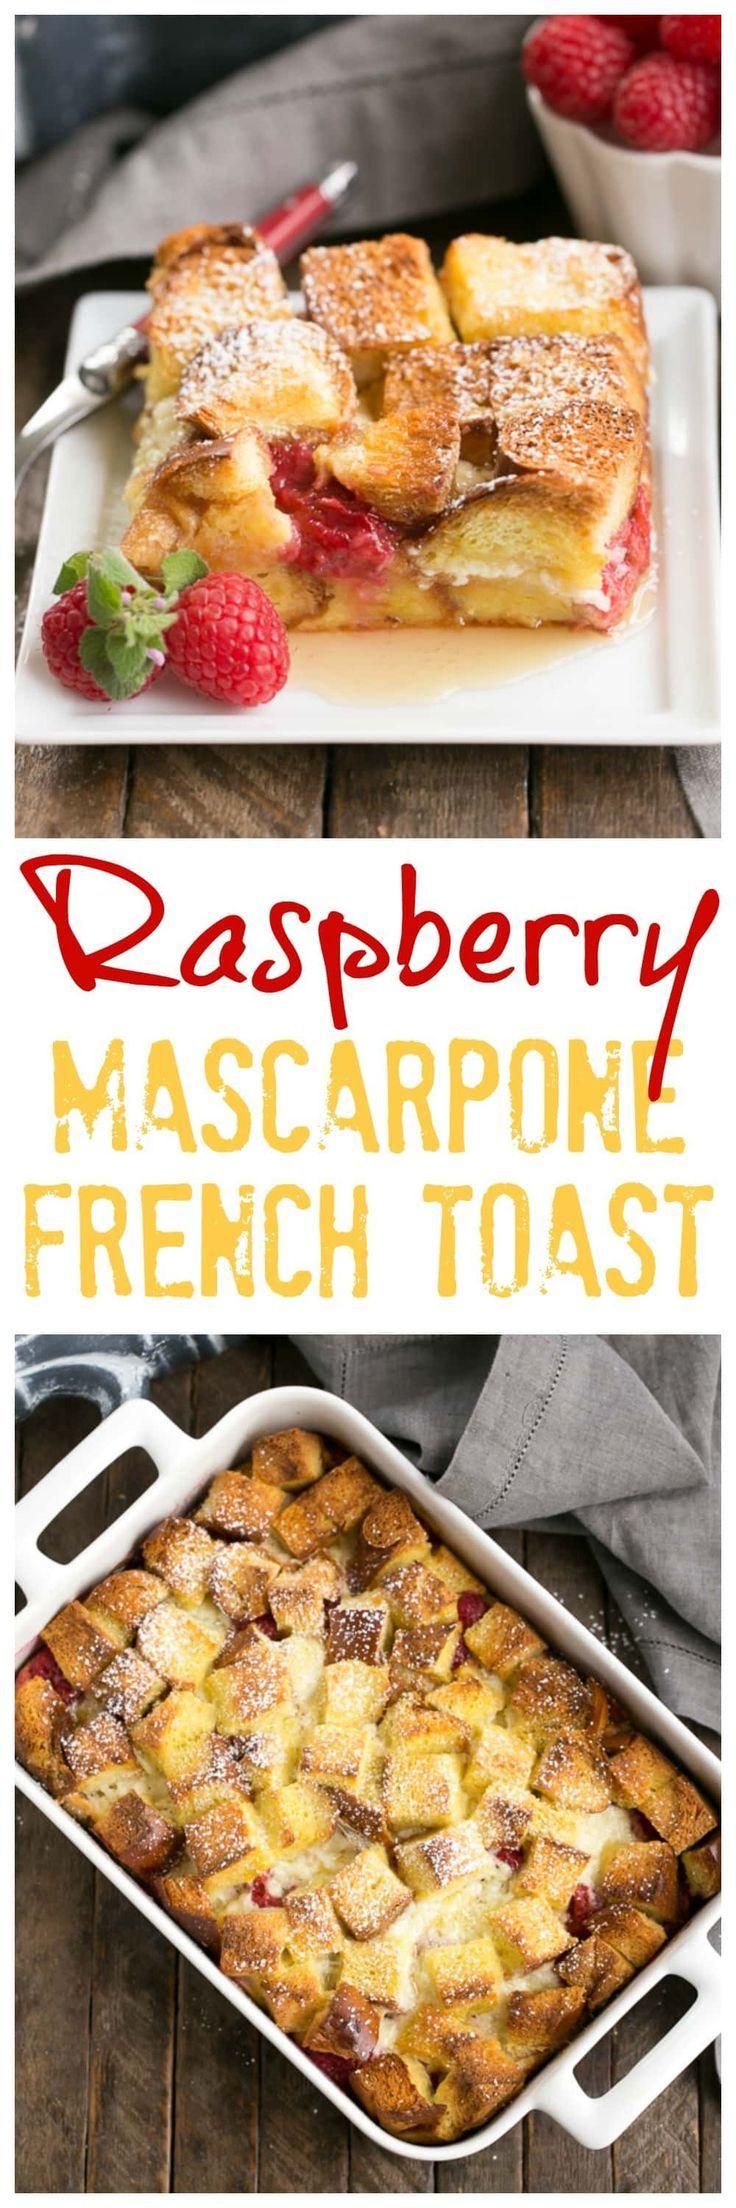 Raspberry Mascarpone French Toast Casserole | A delectable, make ahead breakfast strata filled with mascarpone cream and fresh raspberries @lizzydo